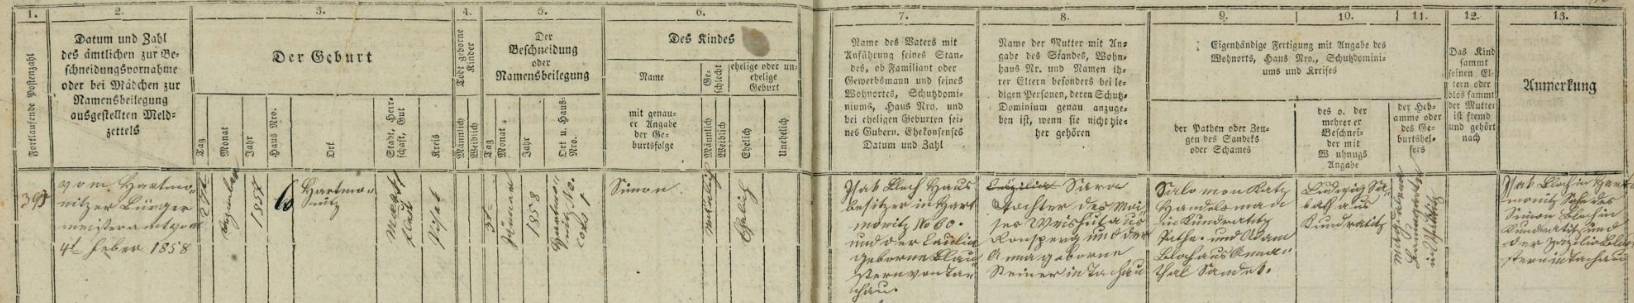 Záznam sušické židovské matriky o narození jeho syna Simona Blocha